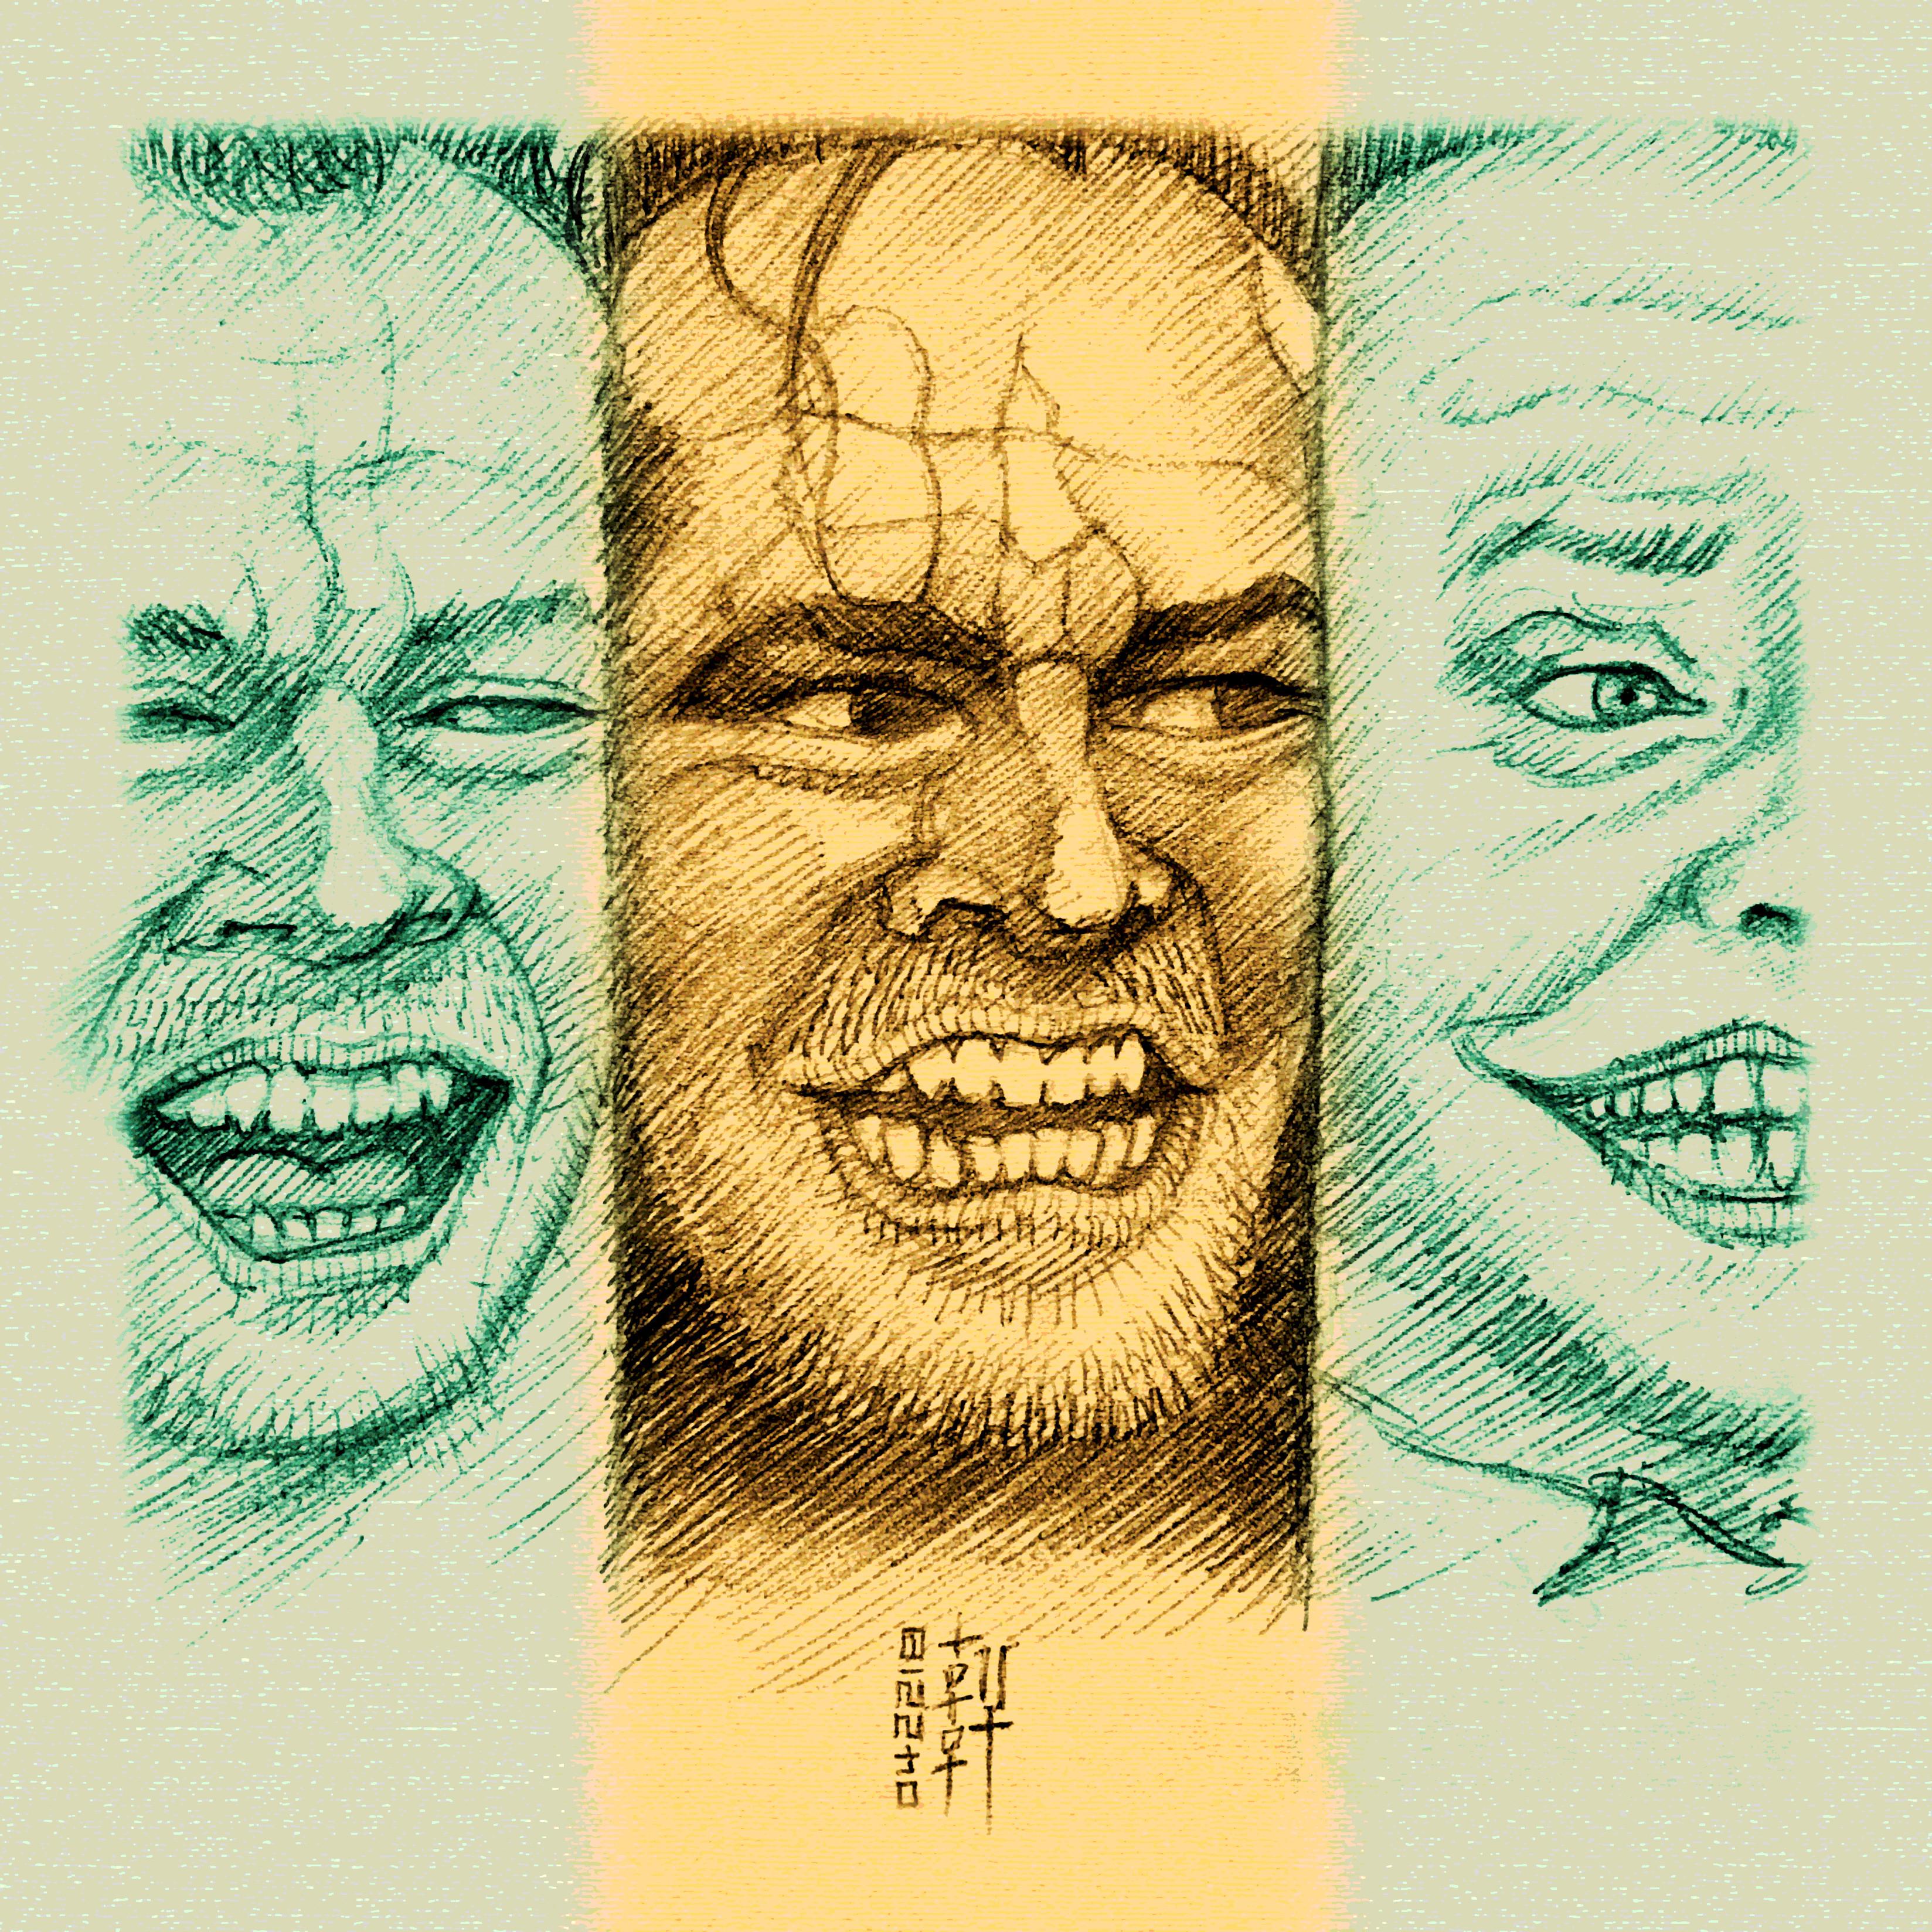 Day 04-22-18 - Jack Nicholson